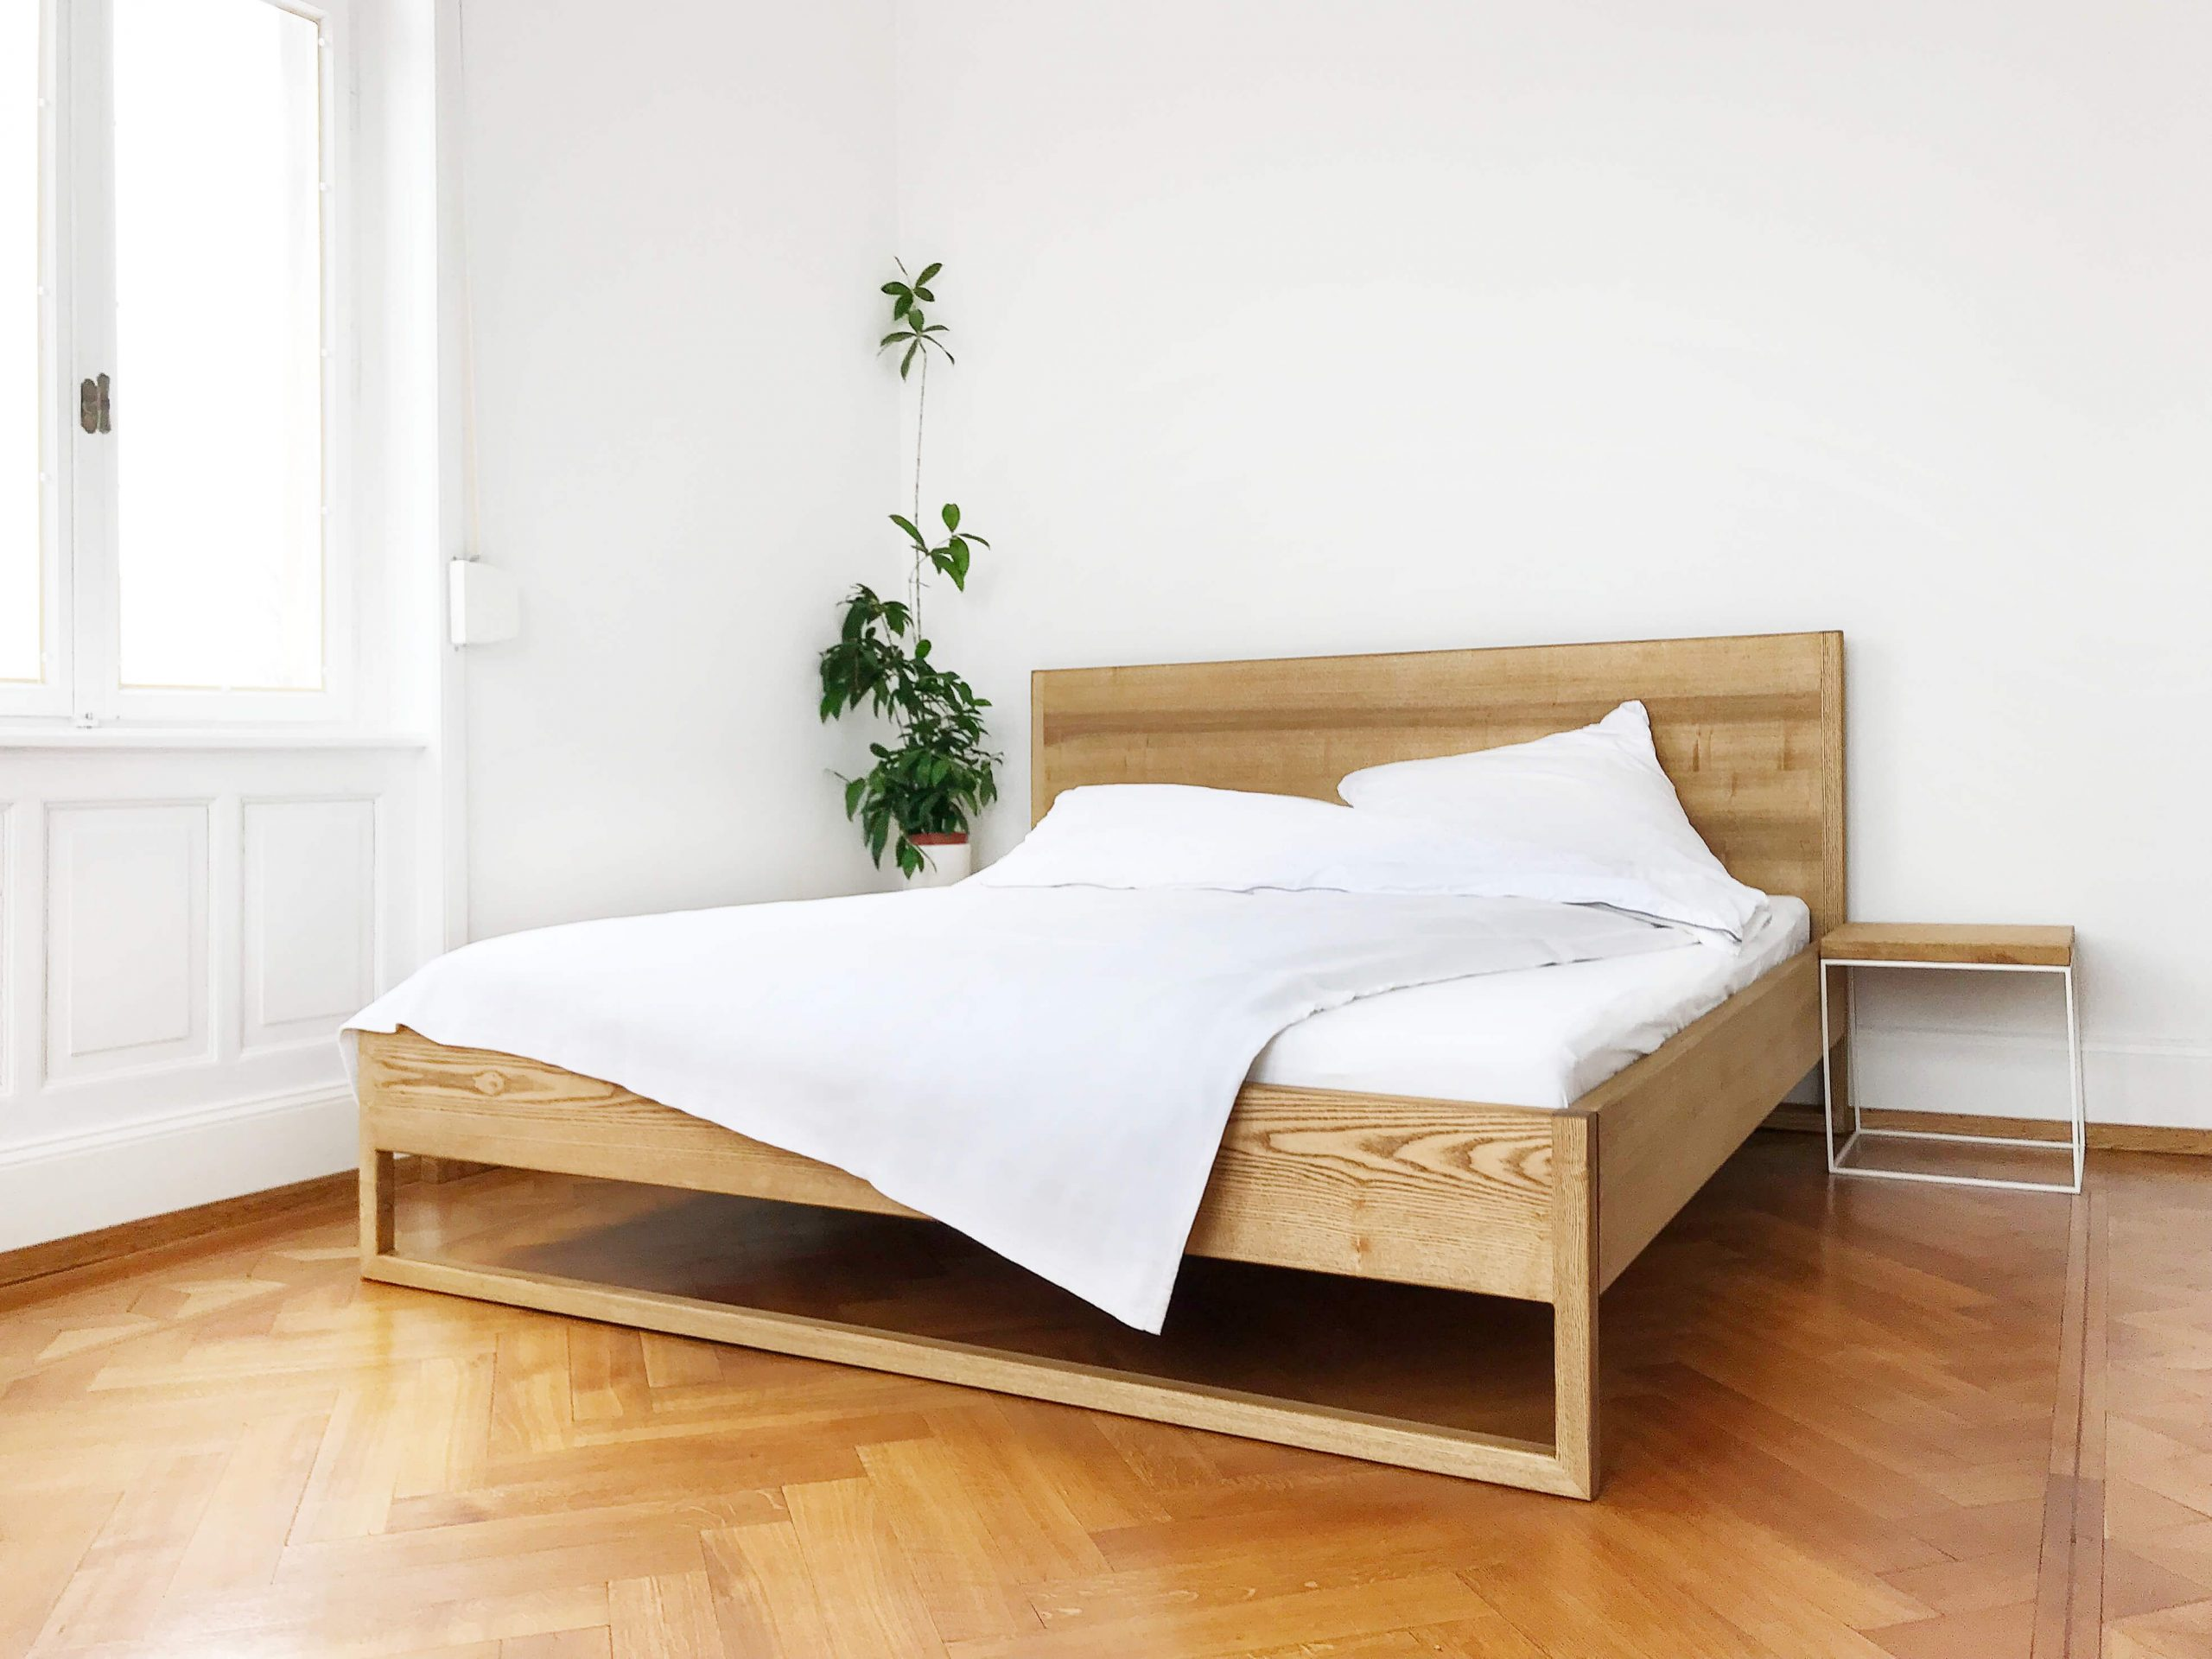 Full Size of Pure Ash Bed Massivholzbett Aus Esche Bett Massivholz Regal Schlafzimmer Klimagerät Für Rauch Komplett Günstig Stuhl Kommode Günstige Wiemann Set Weiß Schlafzimmer Massivholz Schlafzimmer